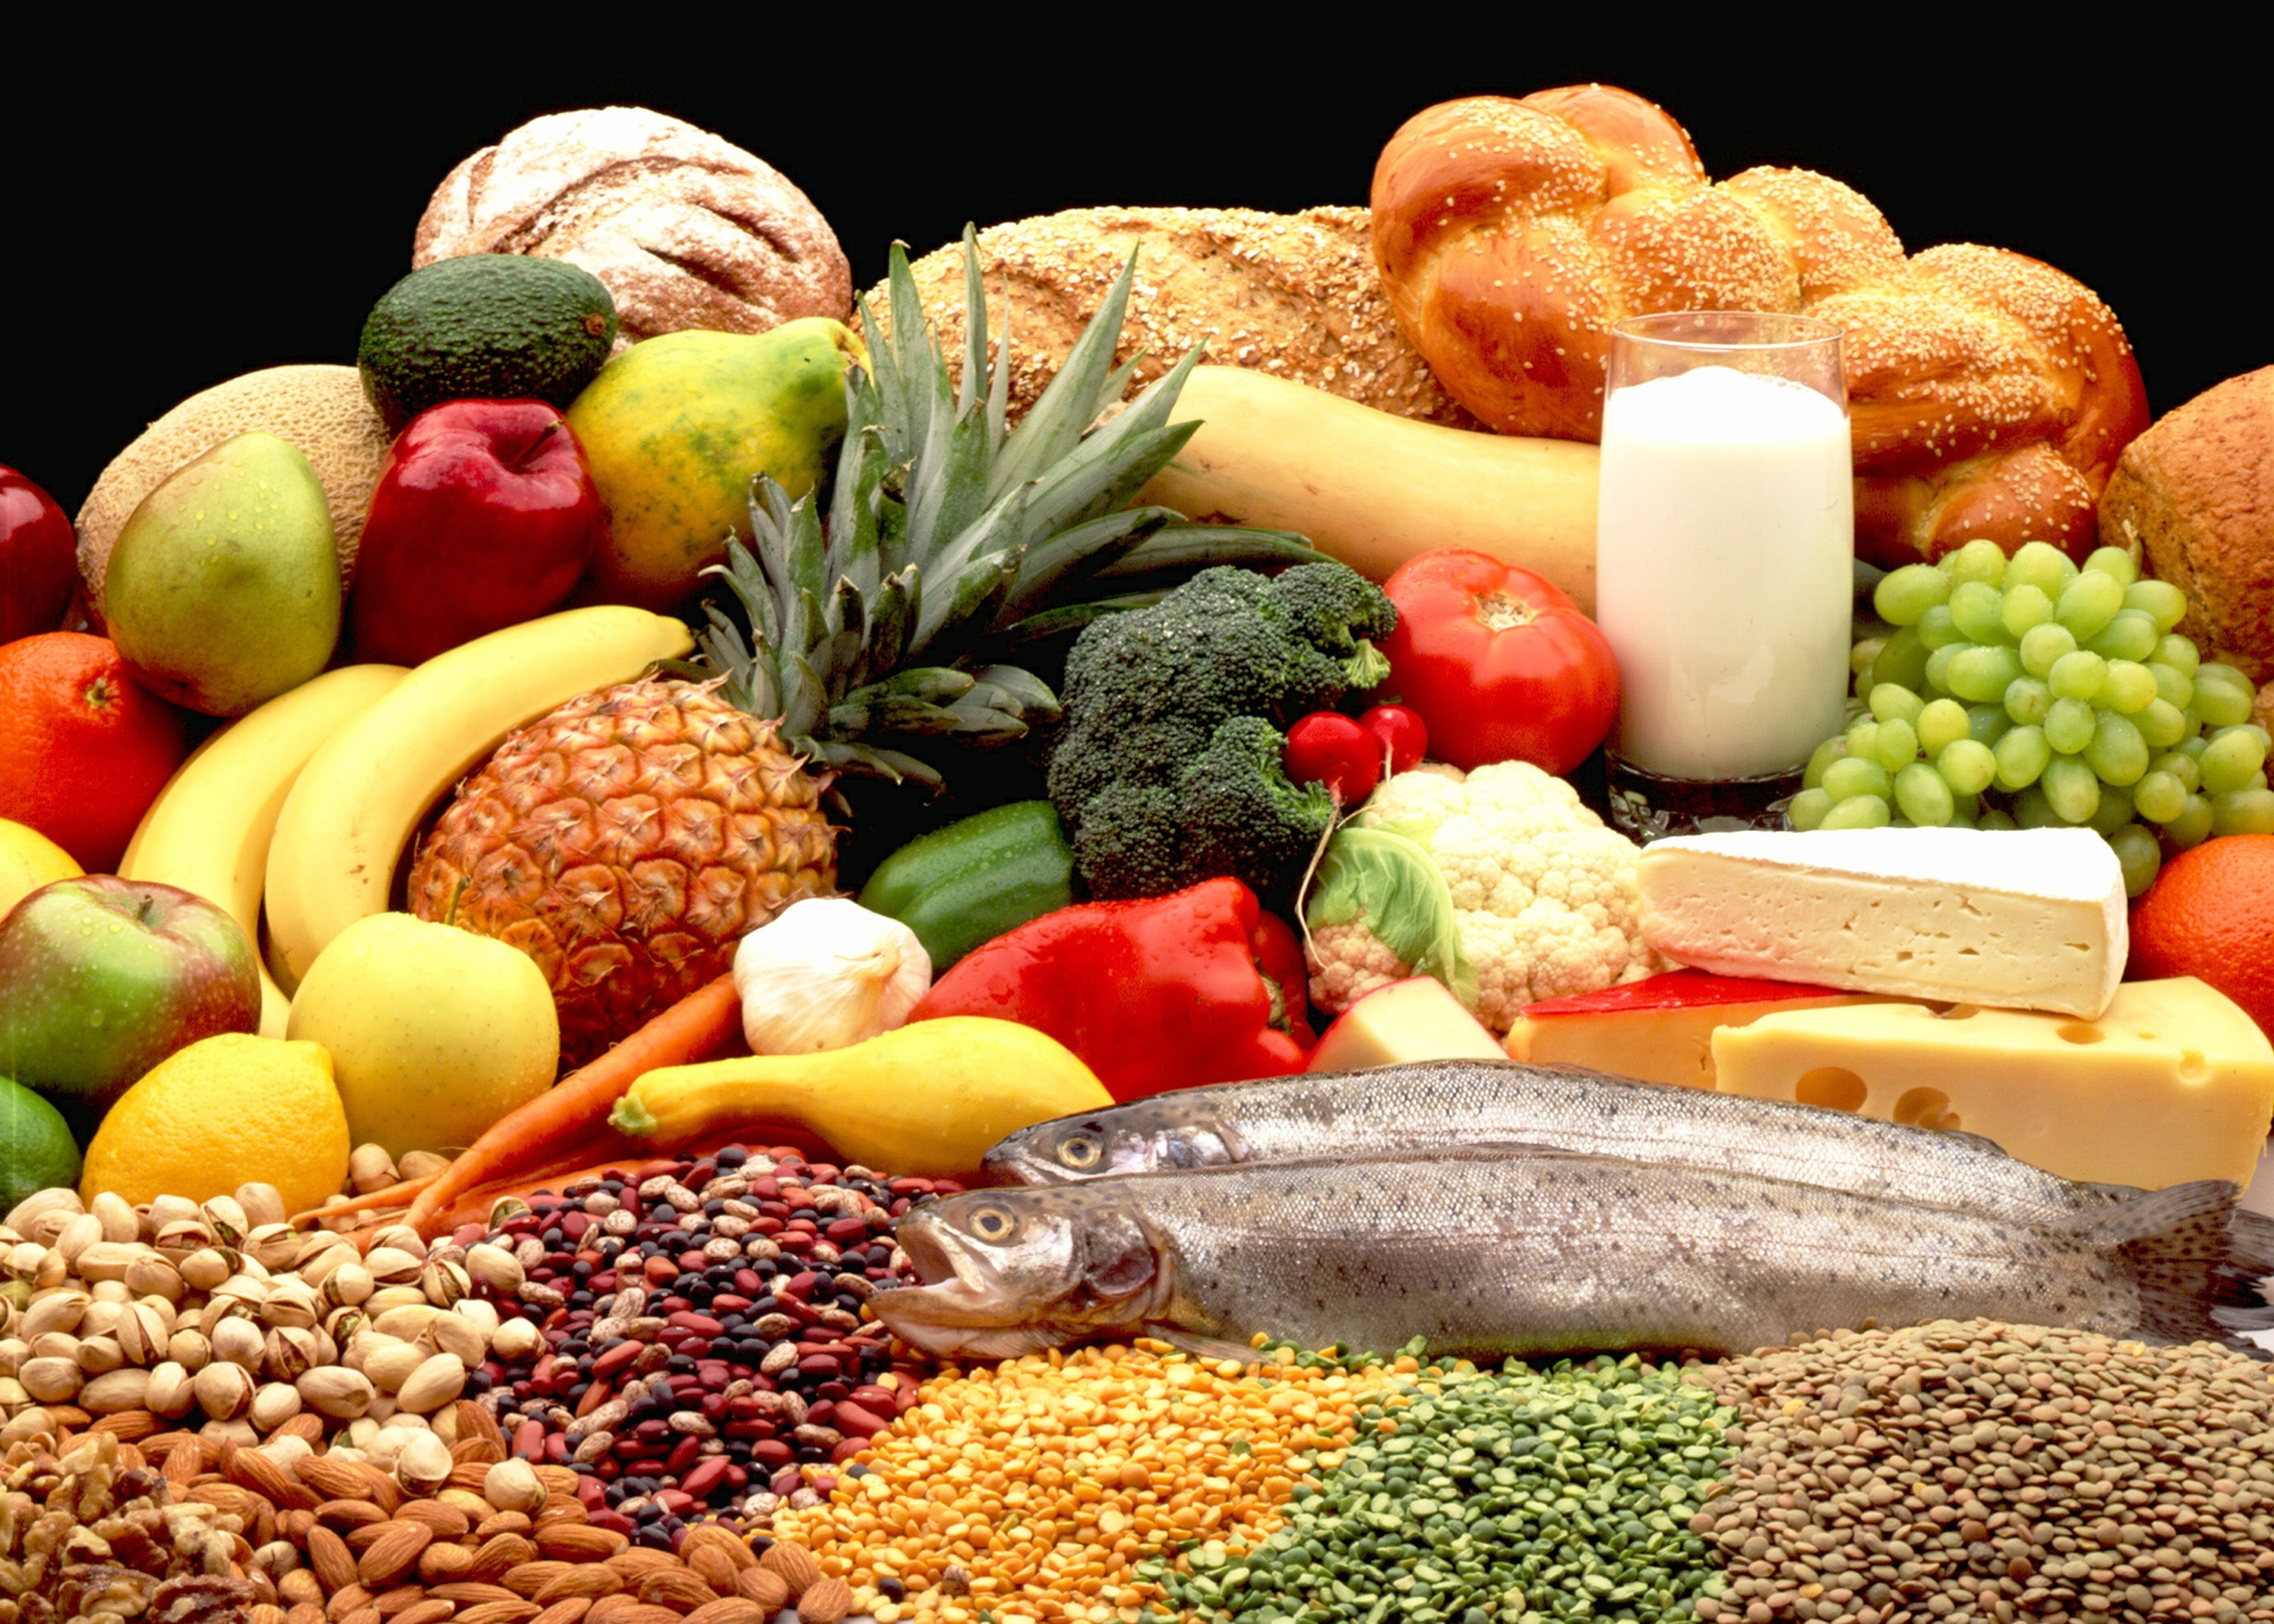 5 Main Types of Healthy Food | Healthfully